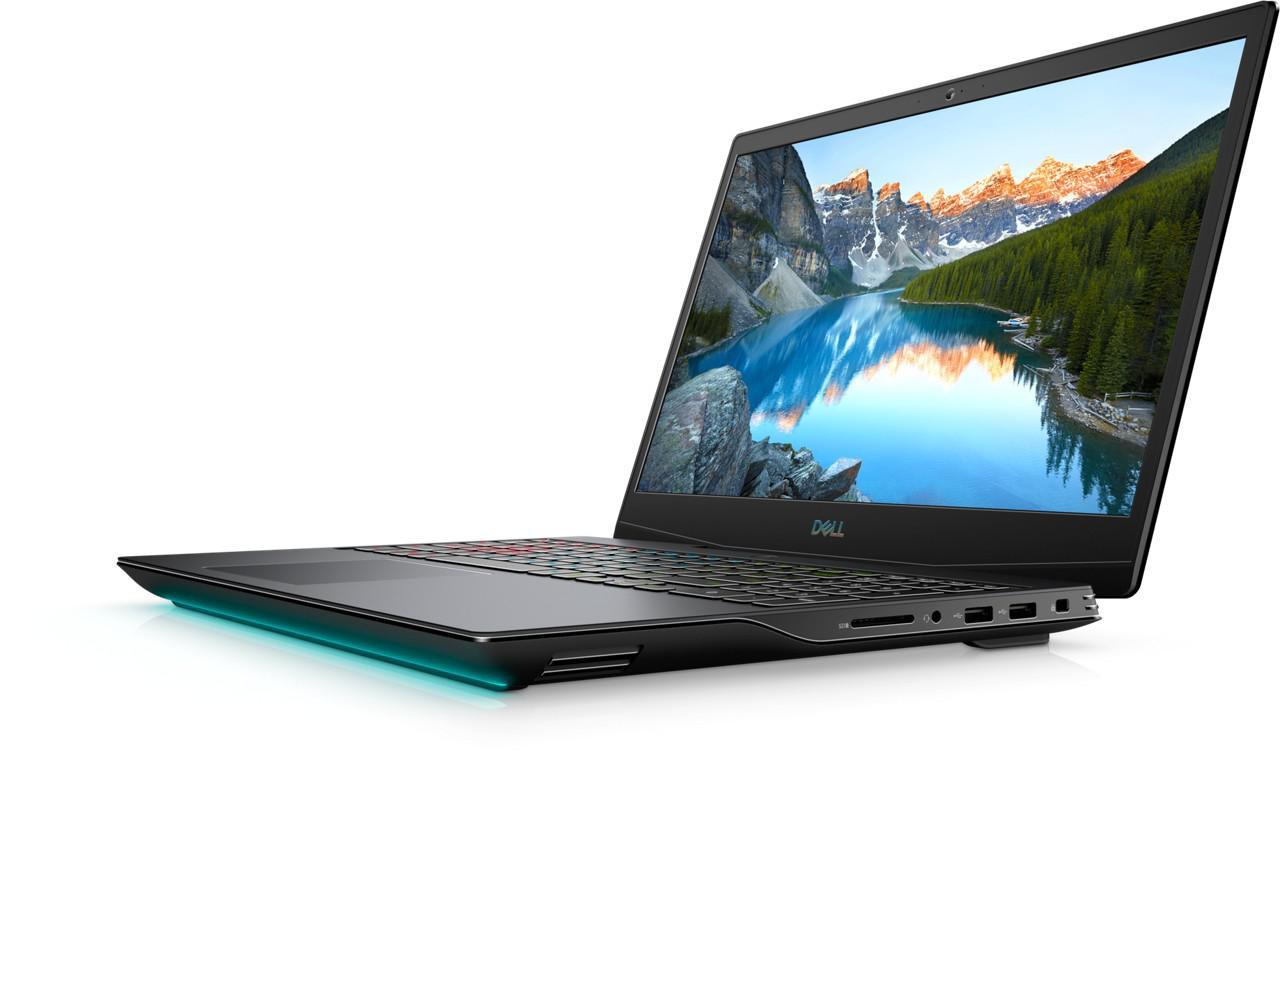 "Laptop Dell Inspiron Gaming 5500 G5, 15.6"" FHD, i7-10750H, 16GB, 1TB SSD, GeForce GTX 1660TI, Ubuntu - imaginea 12"